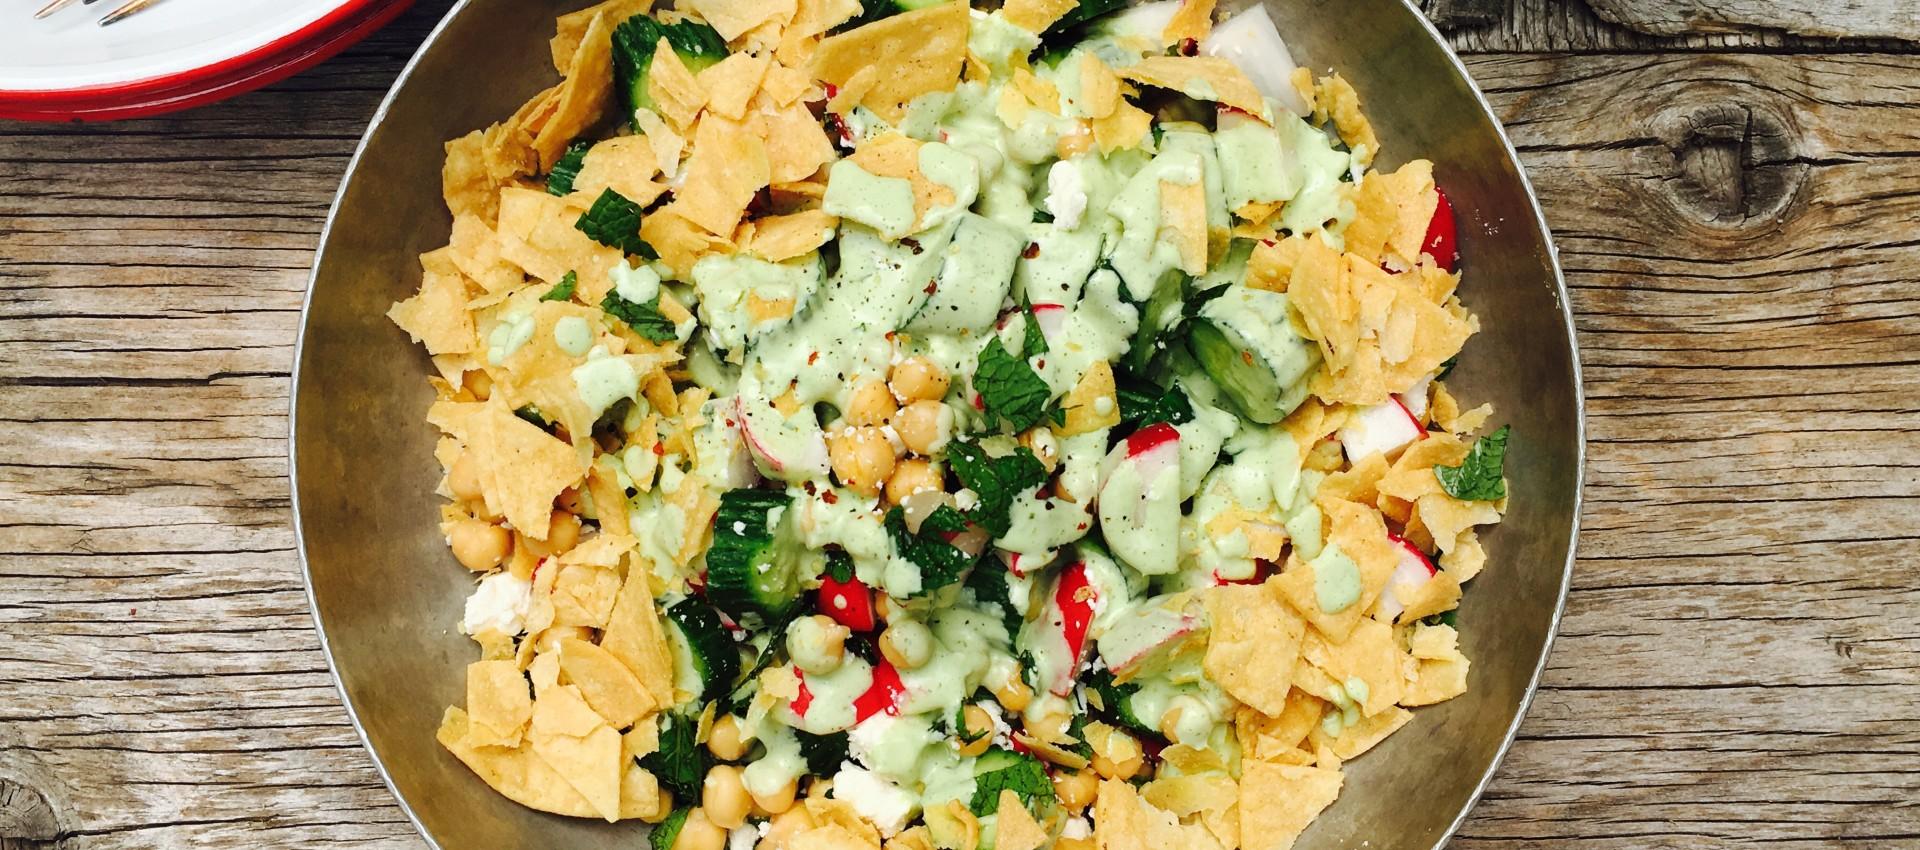 smash salad